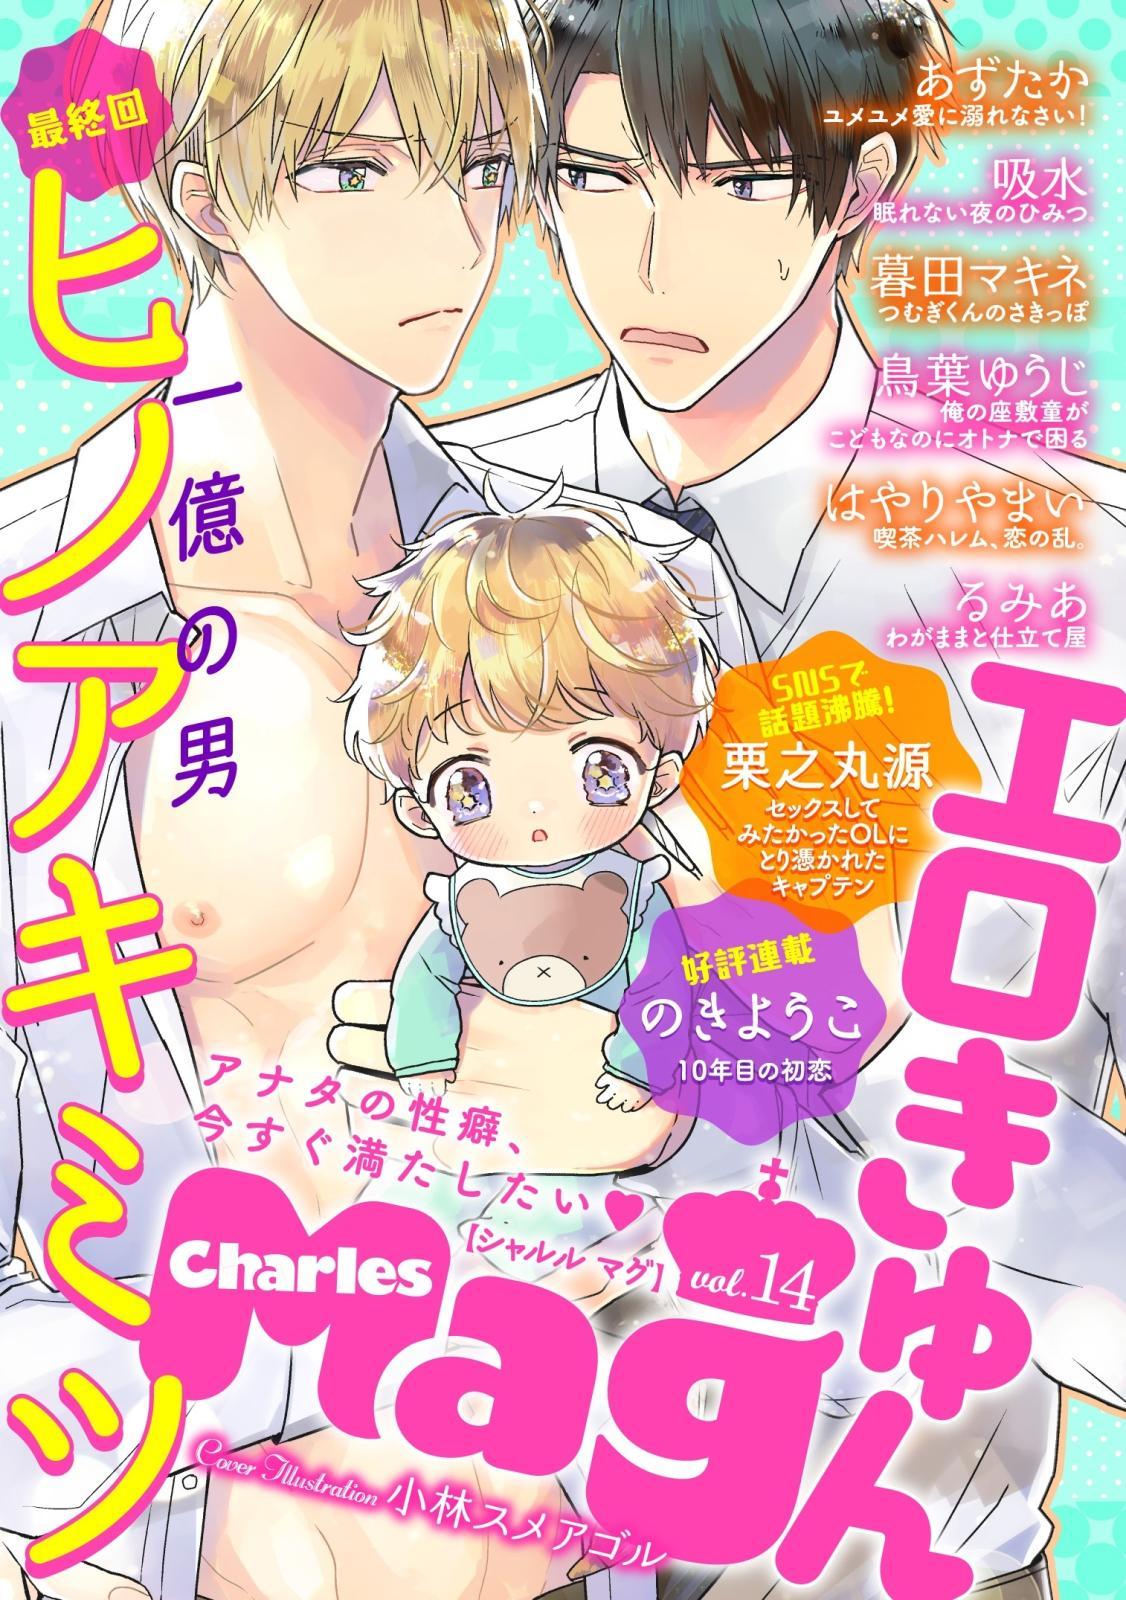 Charles Mag vol.14 -エロきゅん-